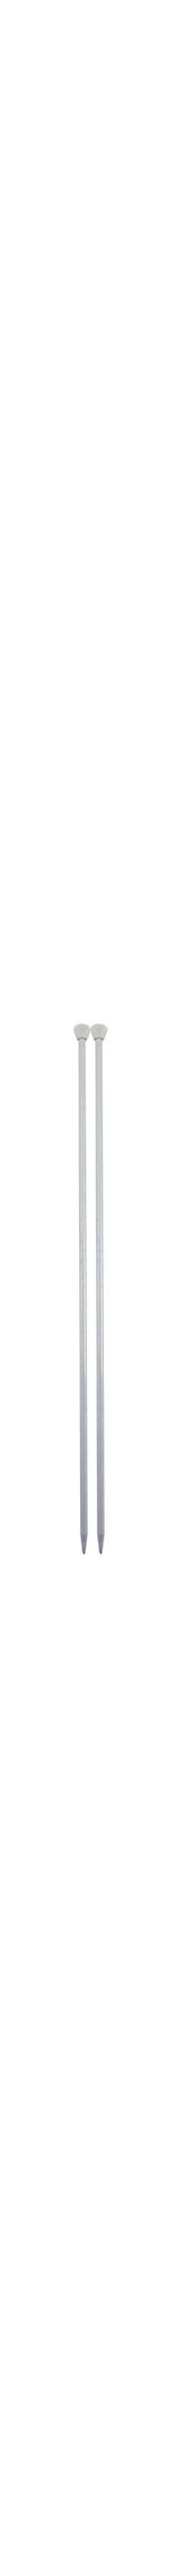 Agulha Para Tricô - 5mm - 100% Alumínio - 35cm - Nacional - Círculo